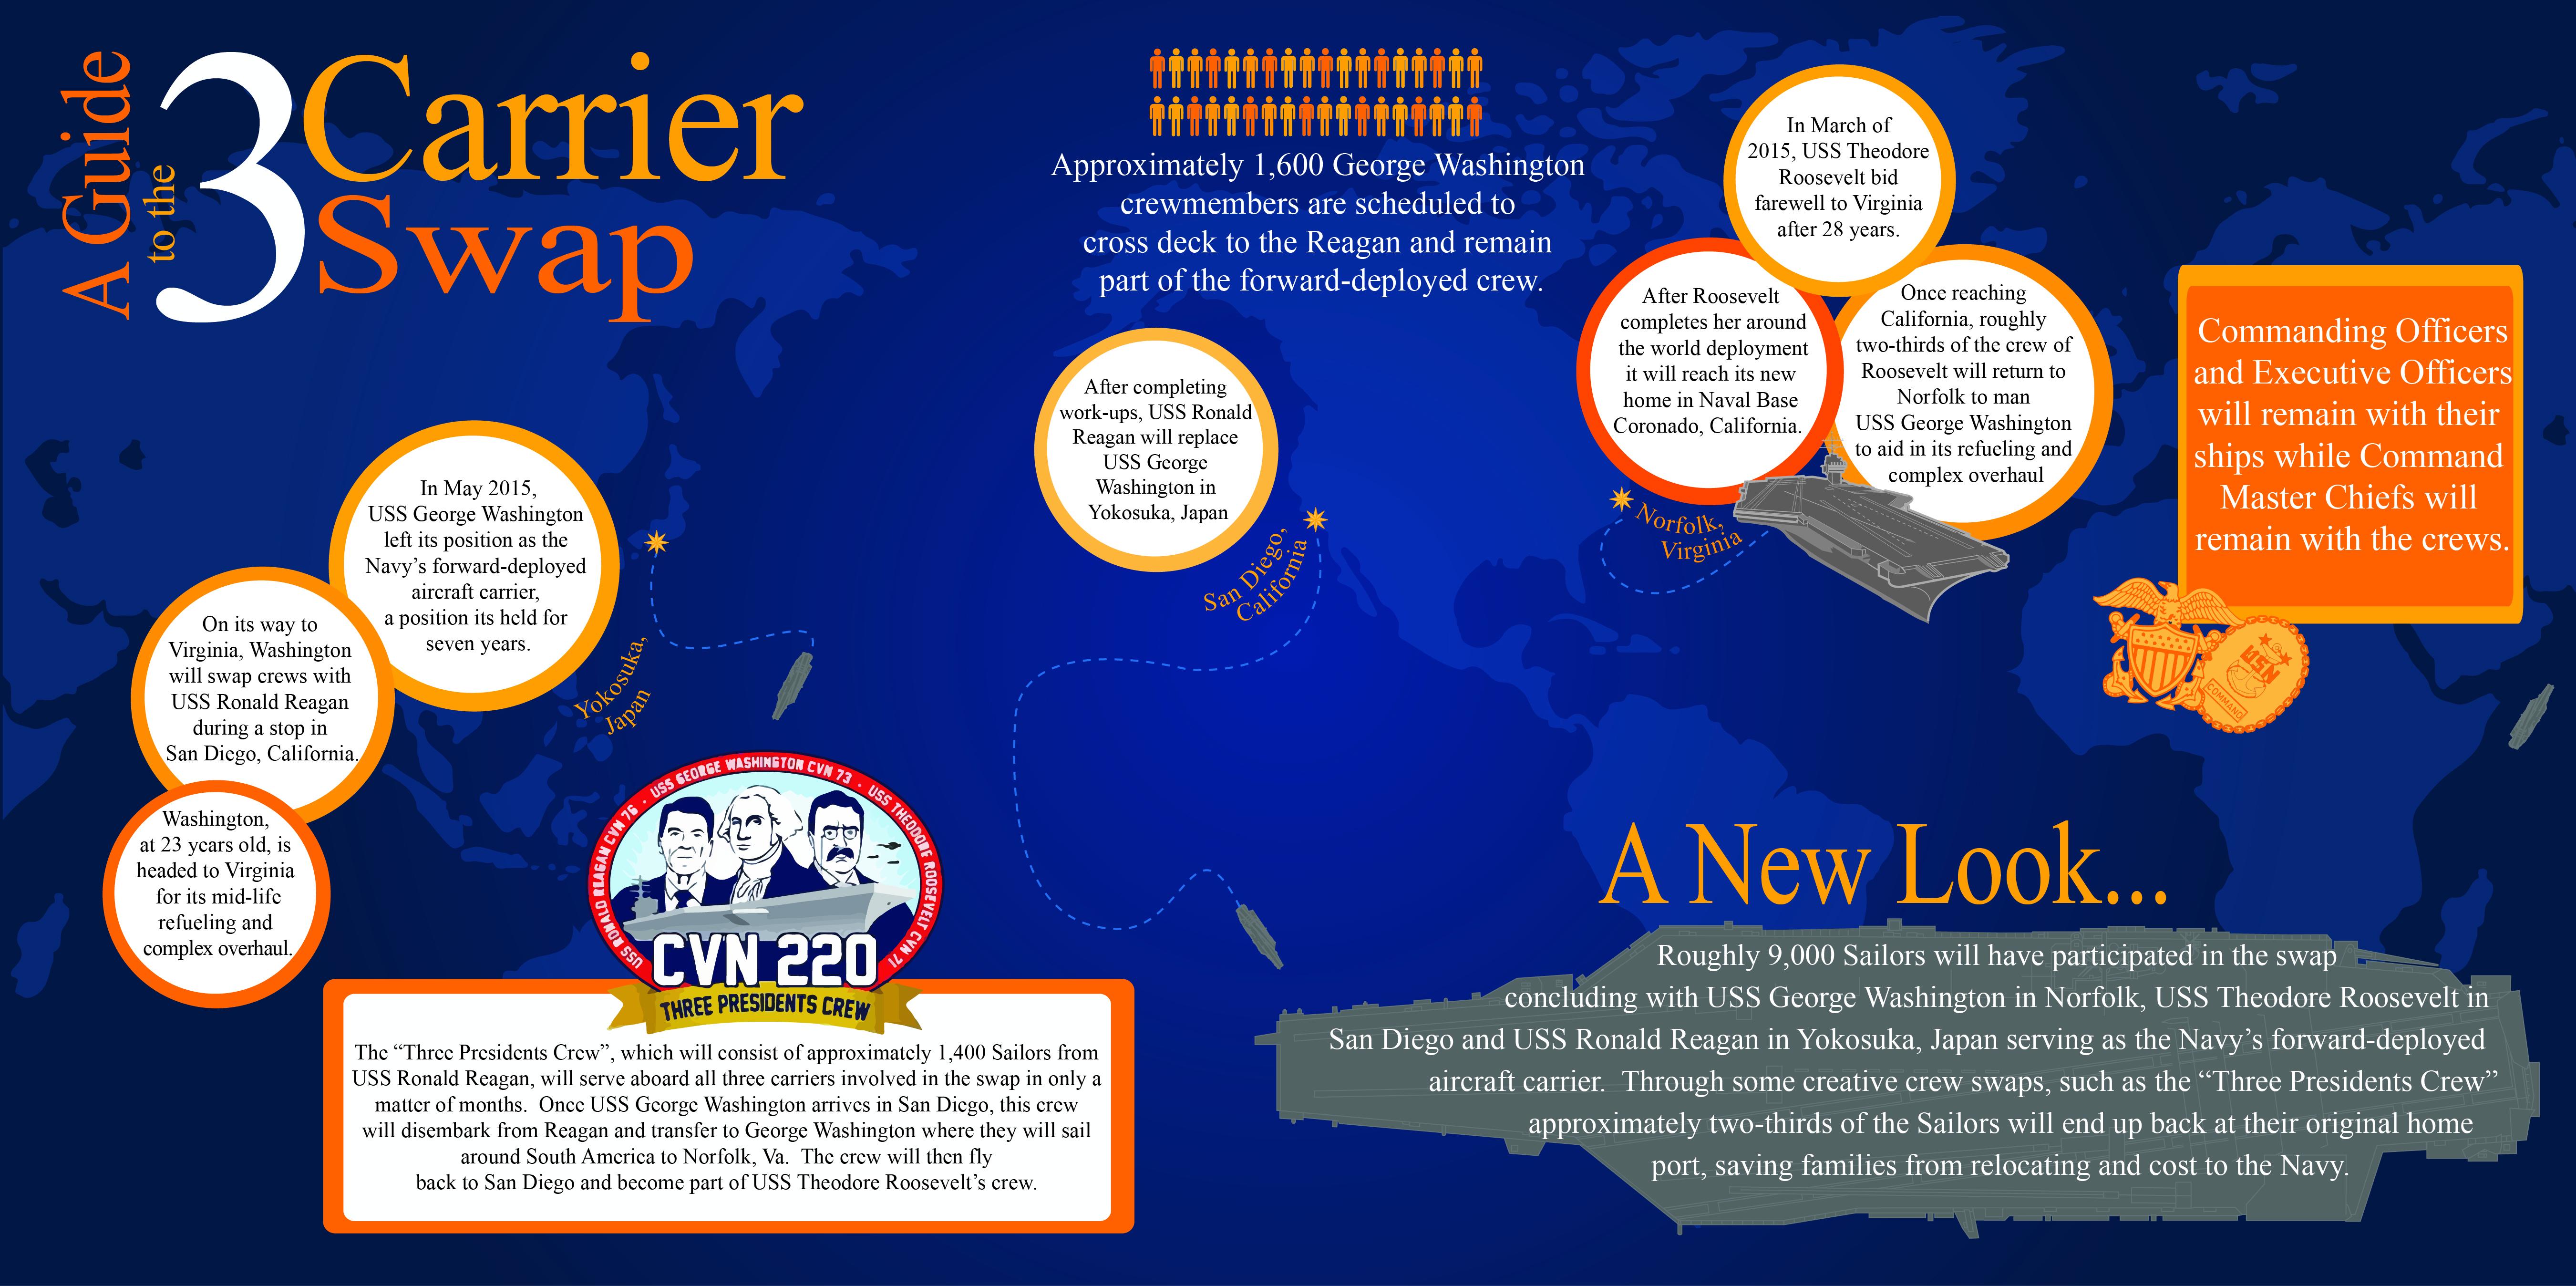 Infographic  3 Carrier Crew Swap Quelle: U.S. navy